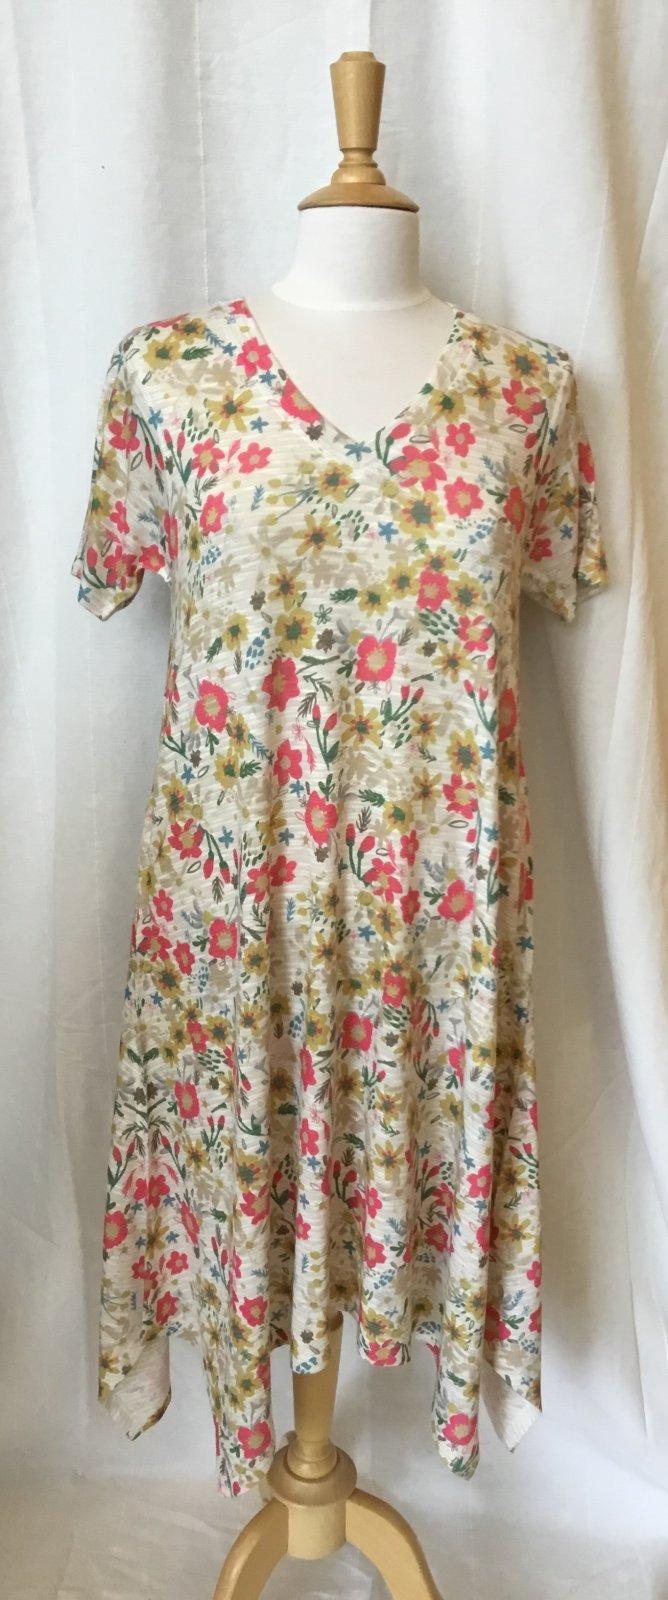 Inoah S/S Dress-Multifloral